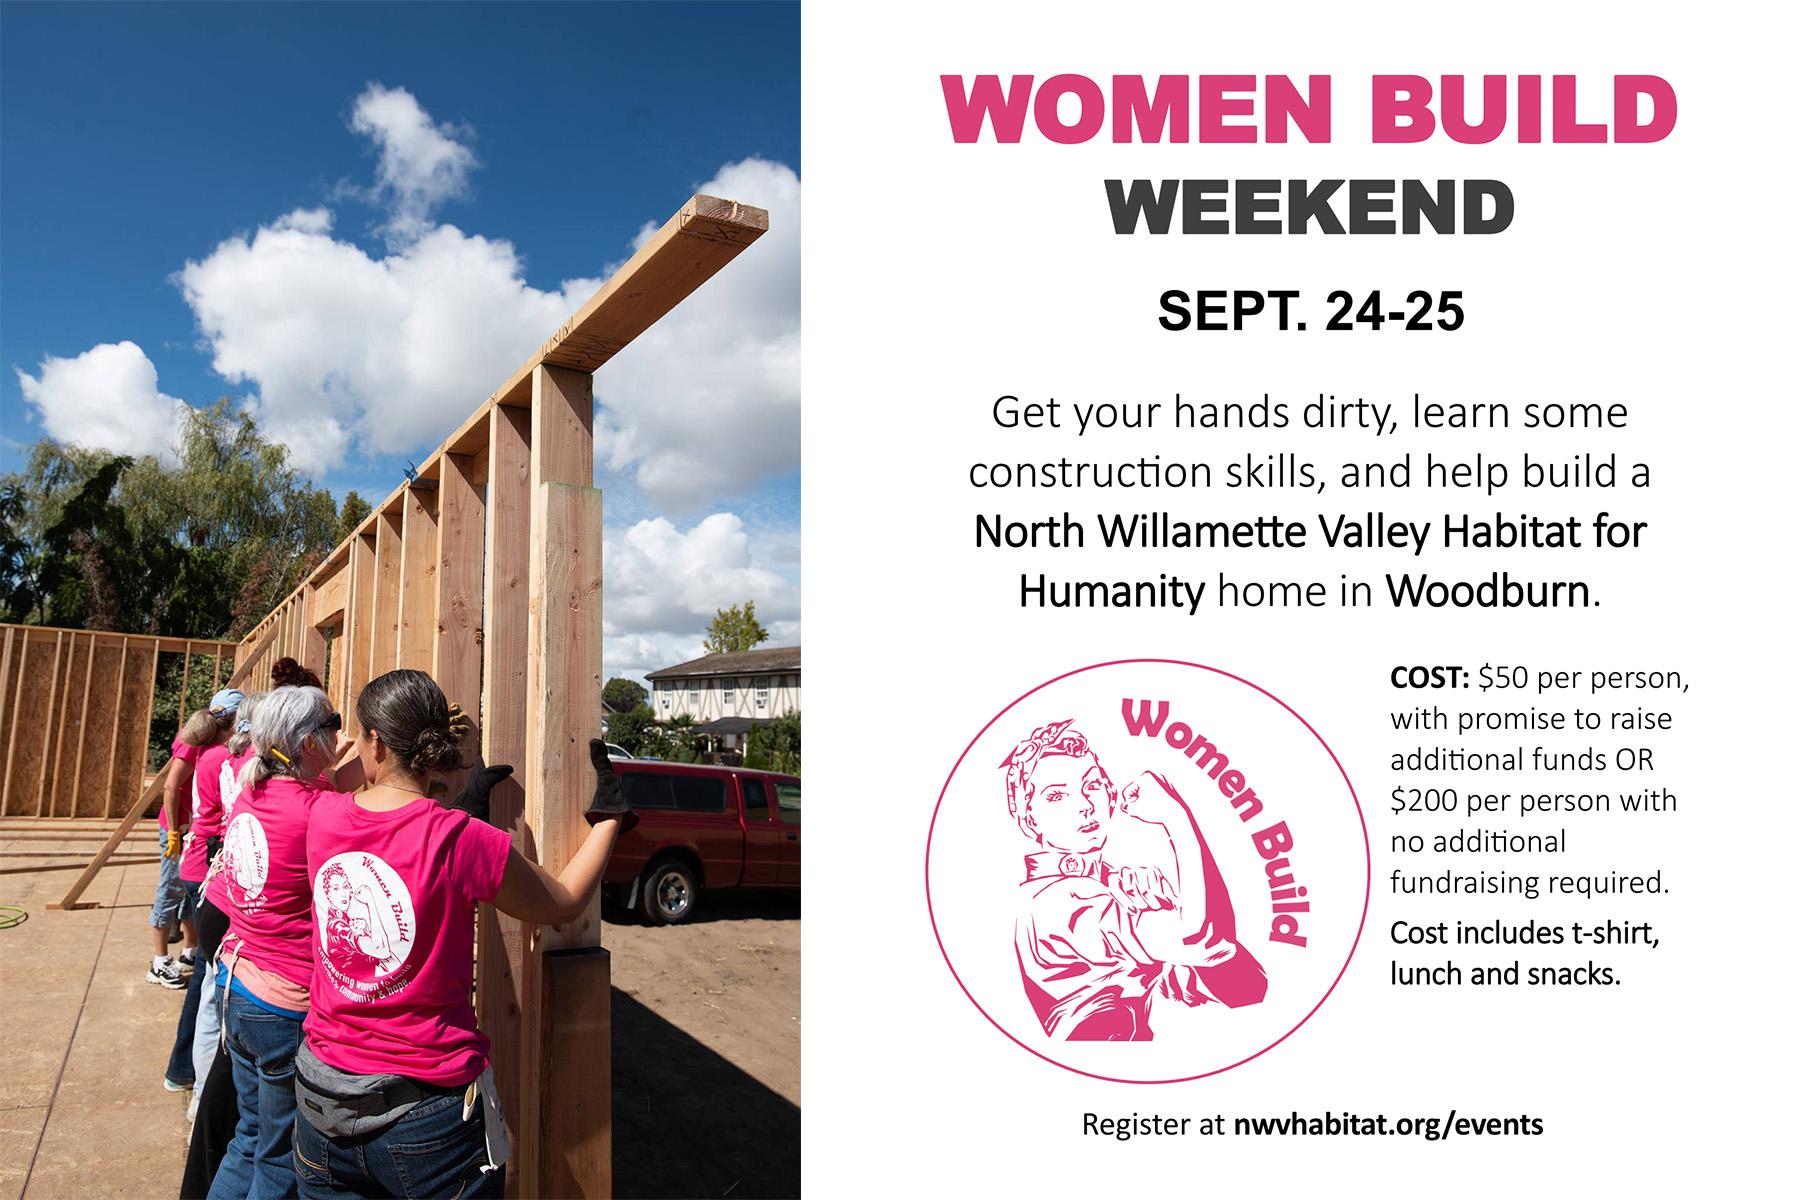 Women Build event